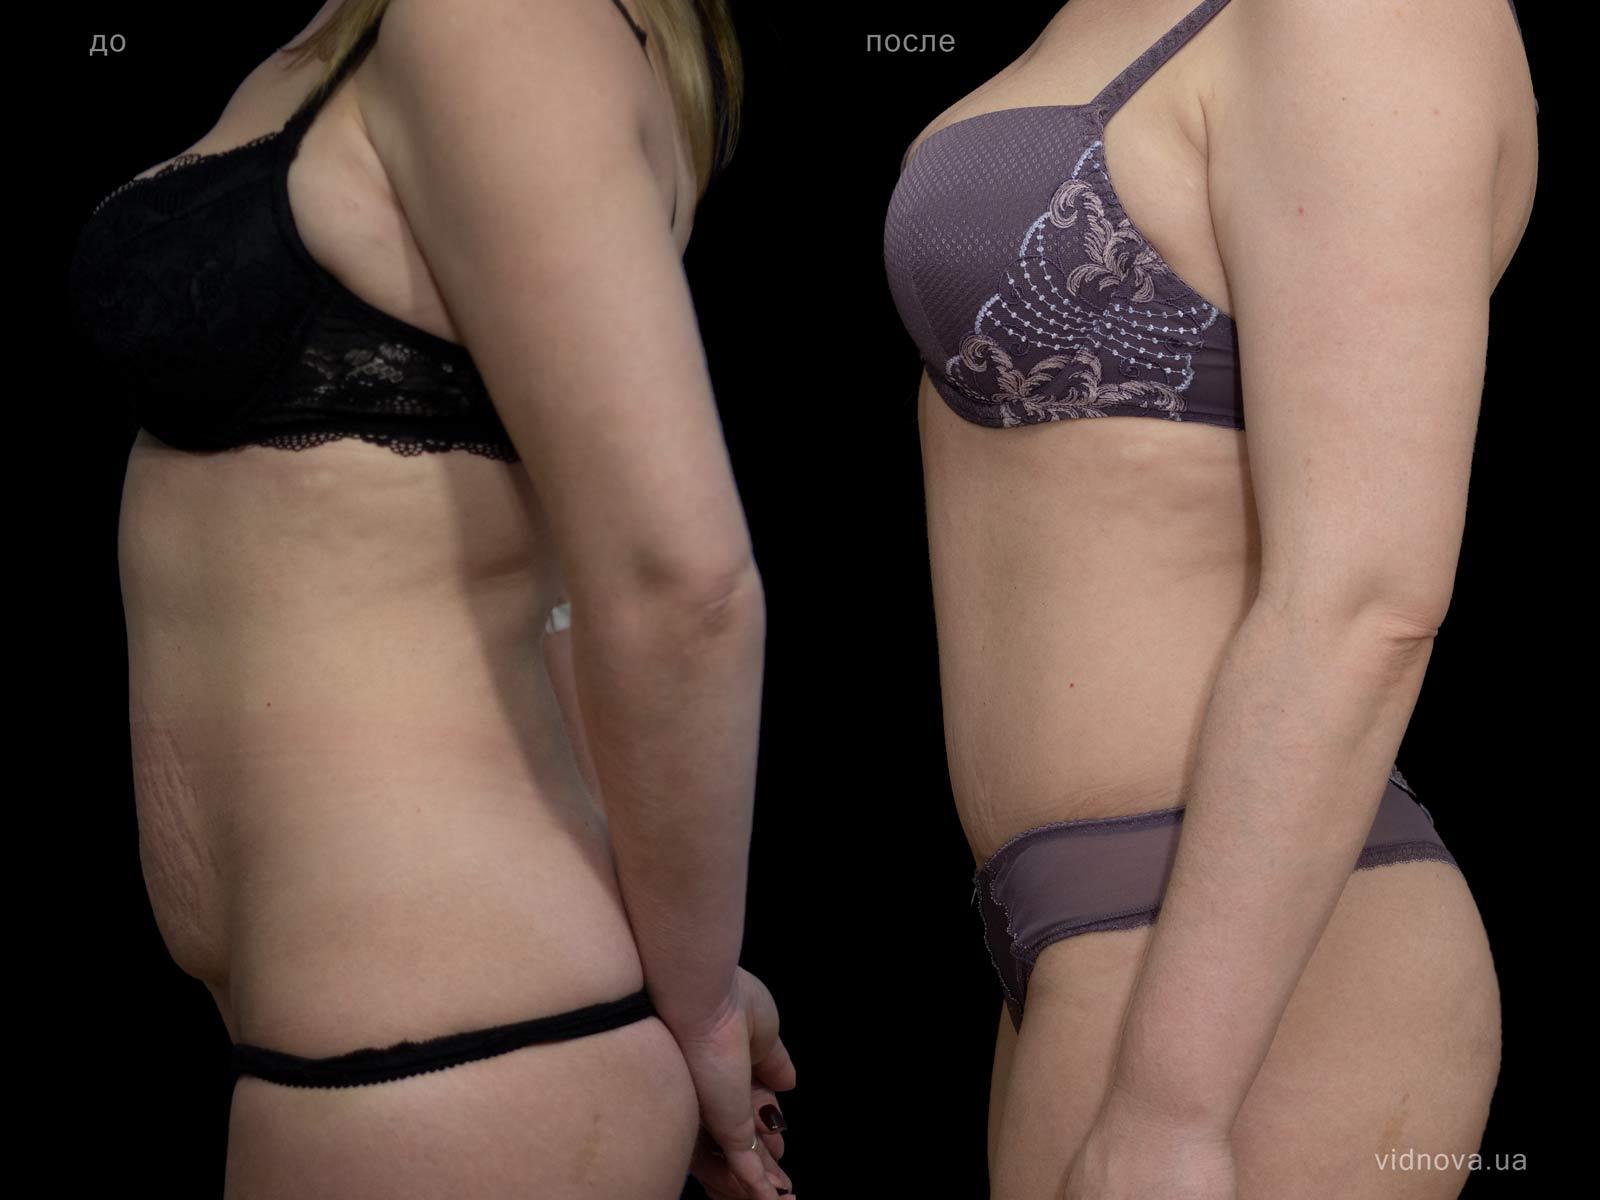 Пластика живота: результаты до и после - Пример №16-2 - Светлана Работенко